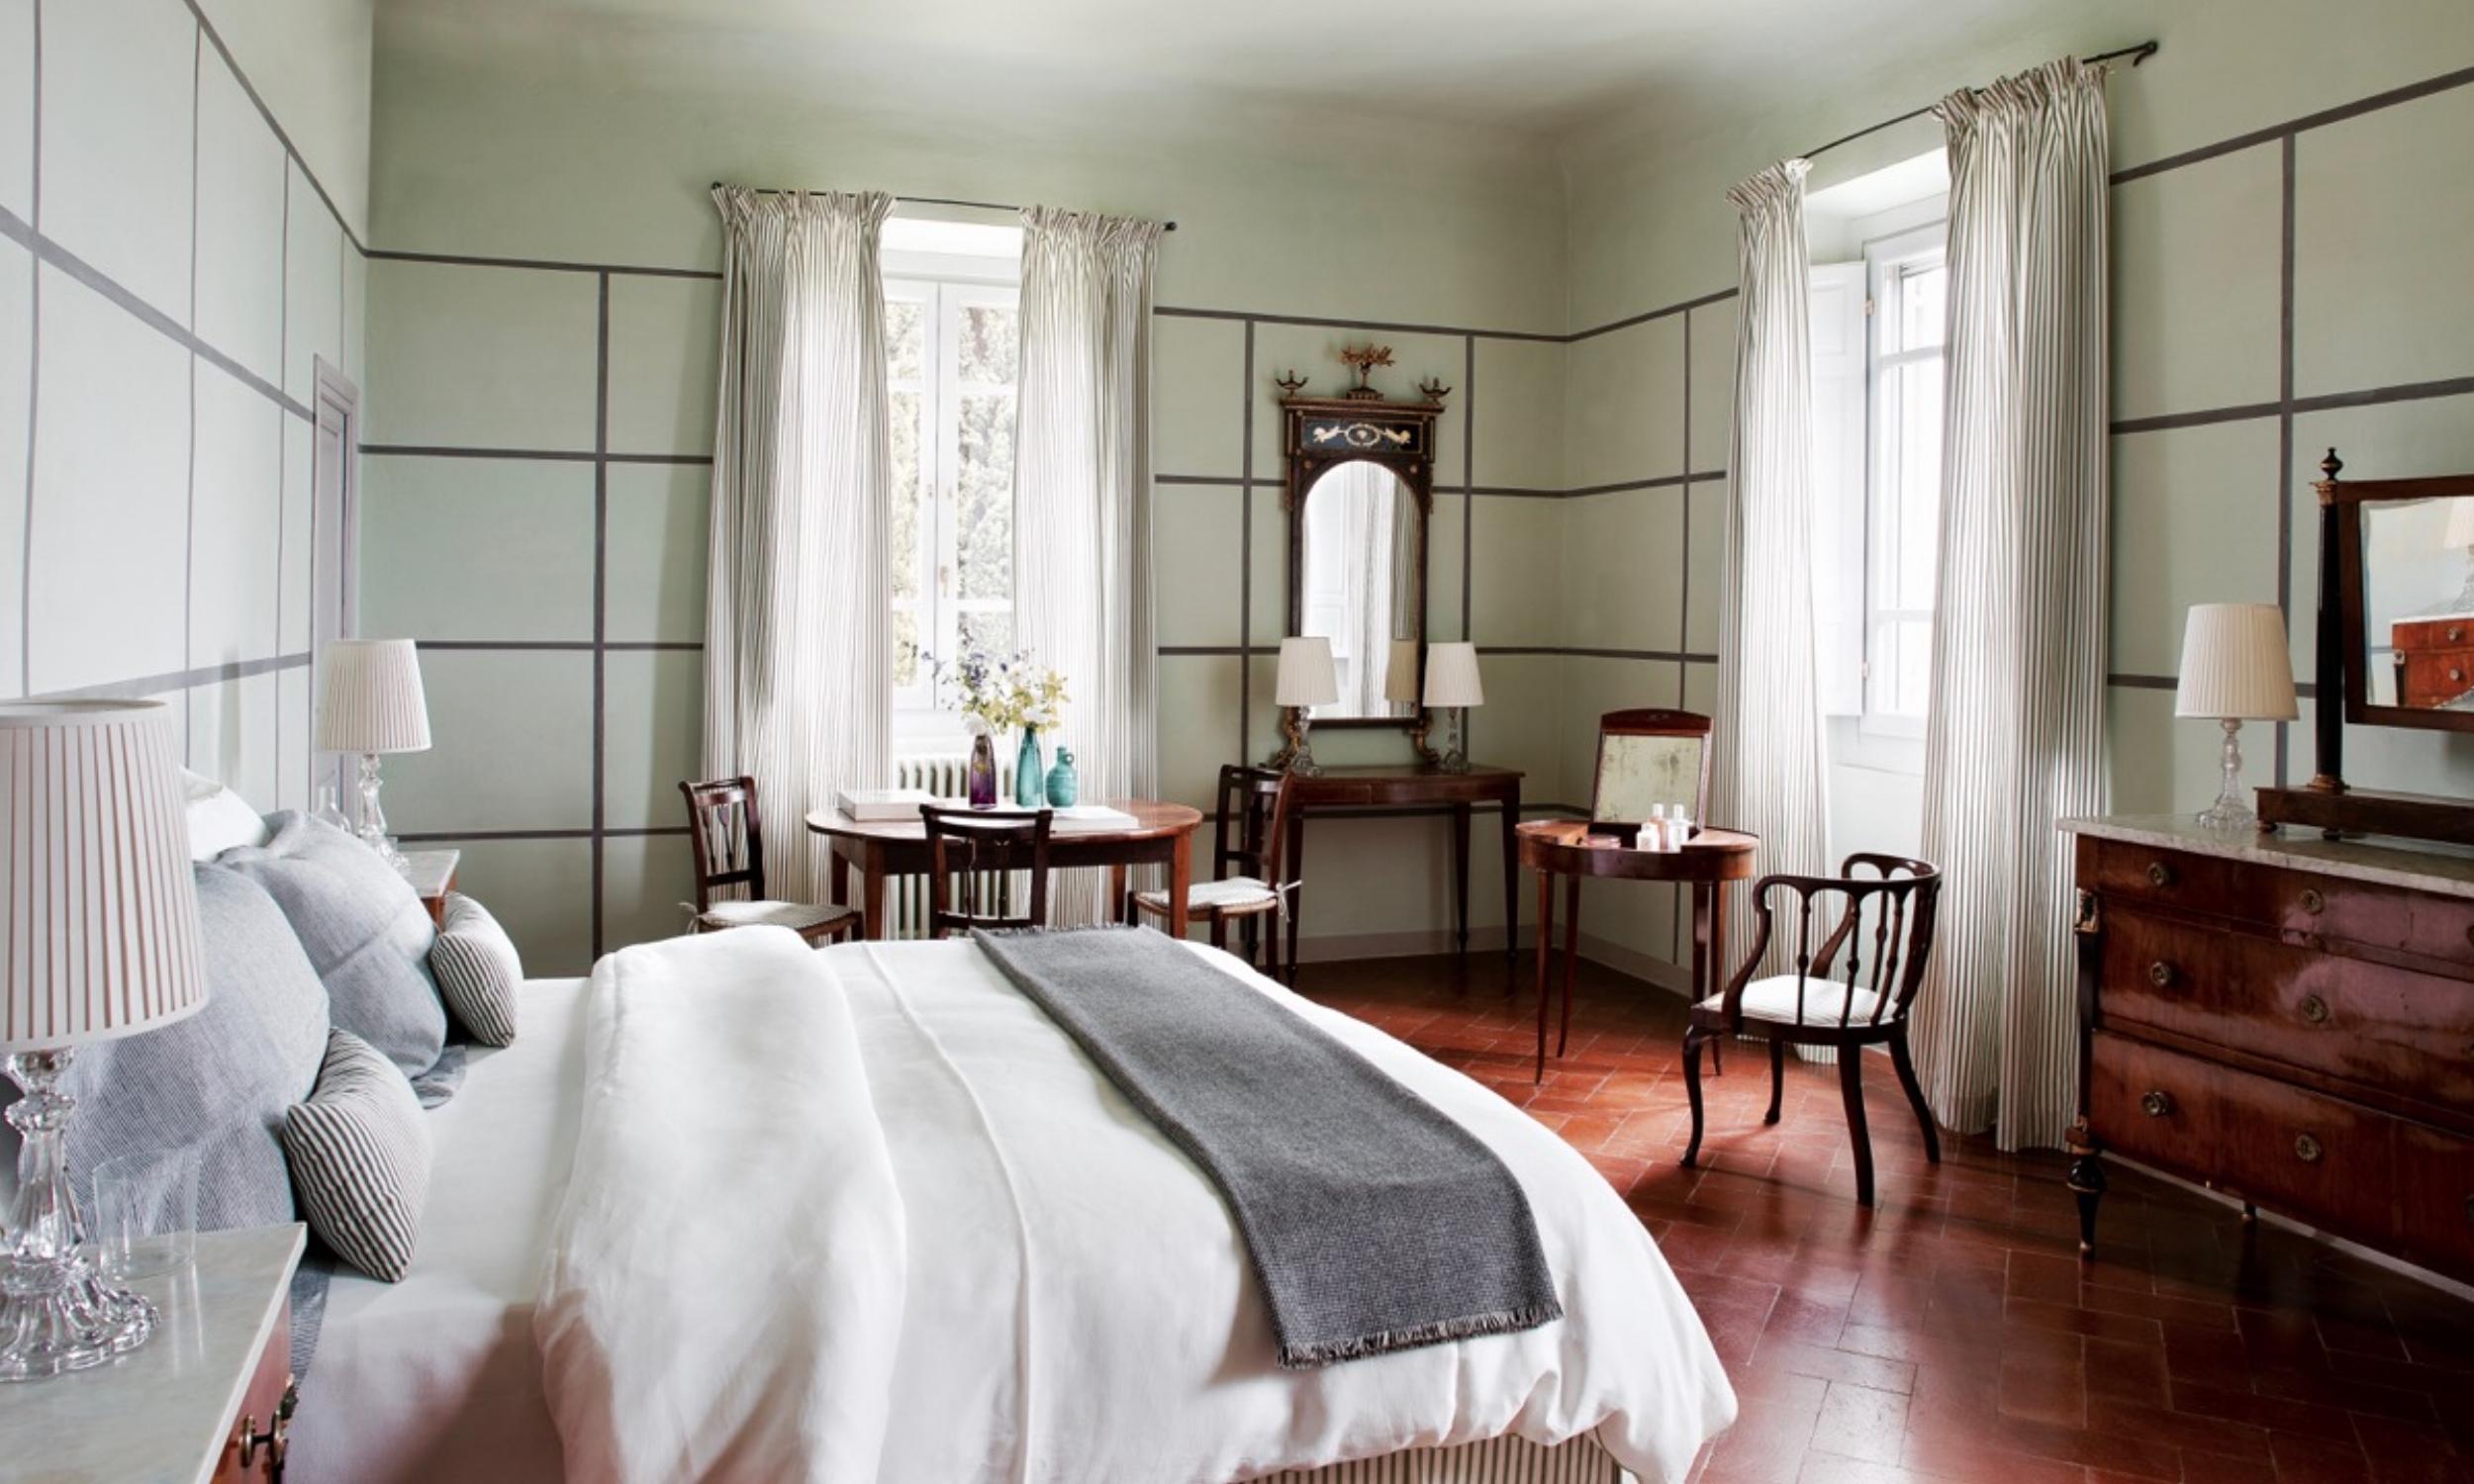 Bedroom_1115045.jpg